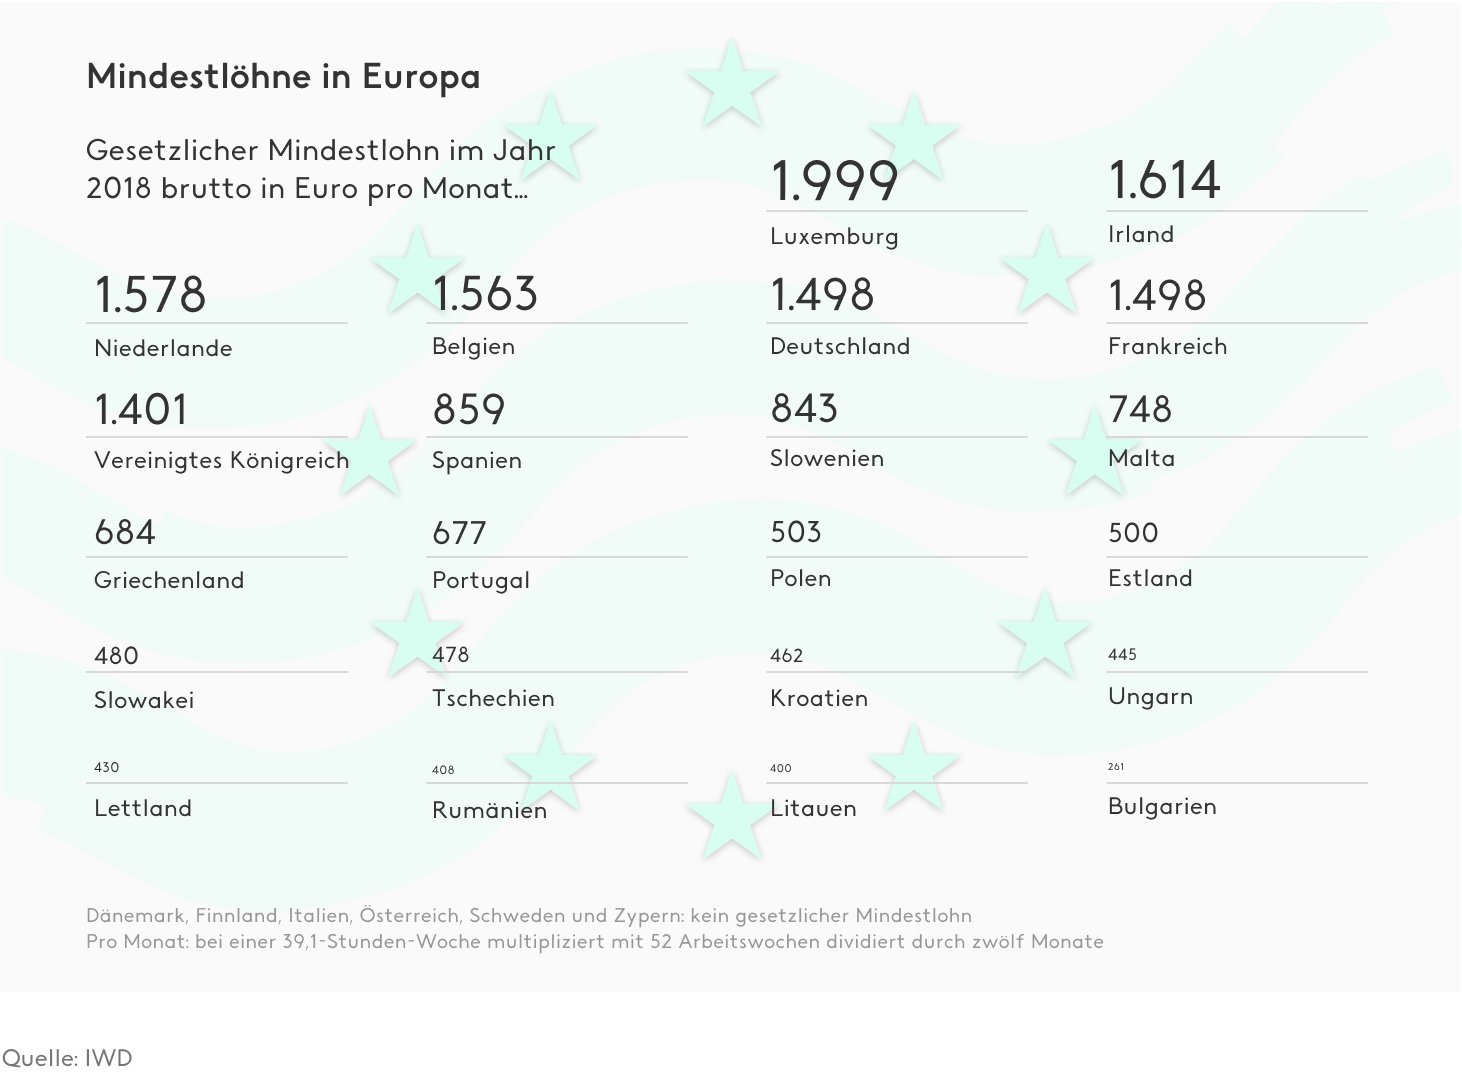 Mindestlohn in Europa